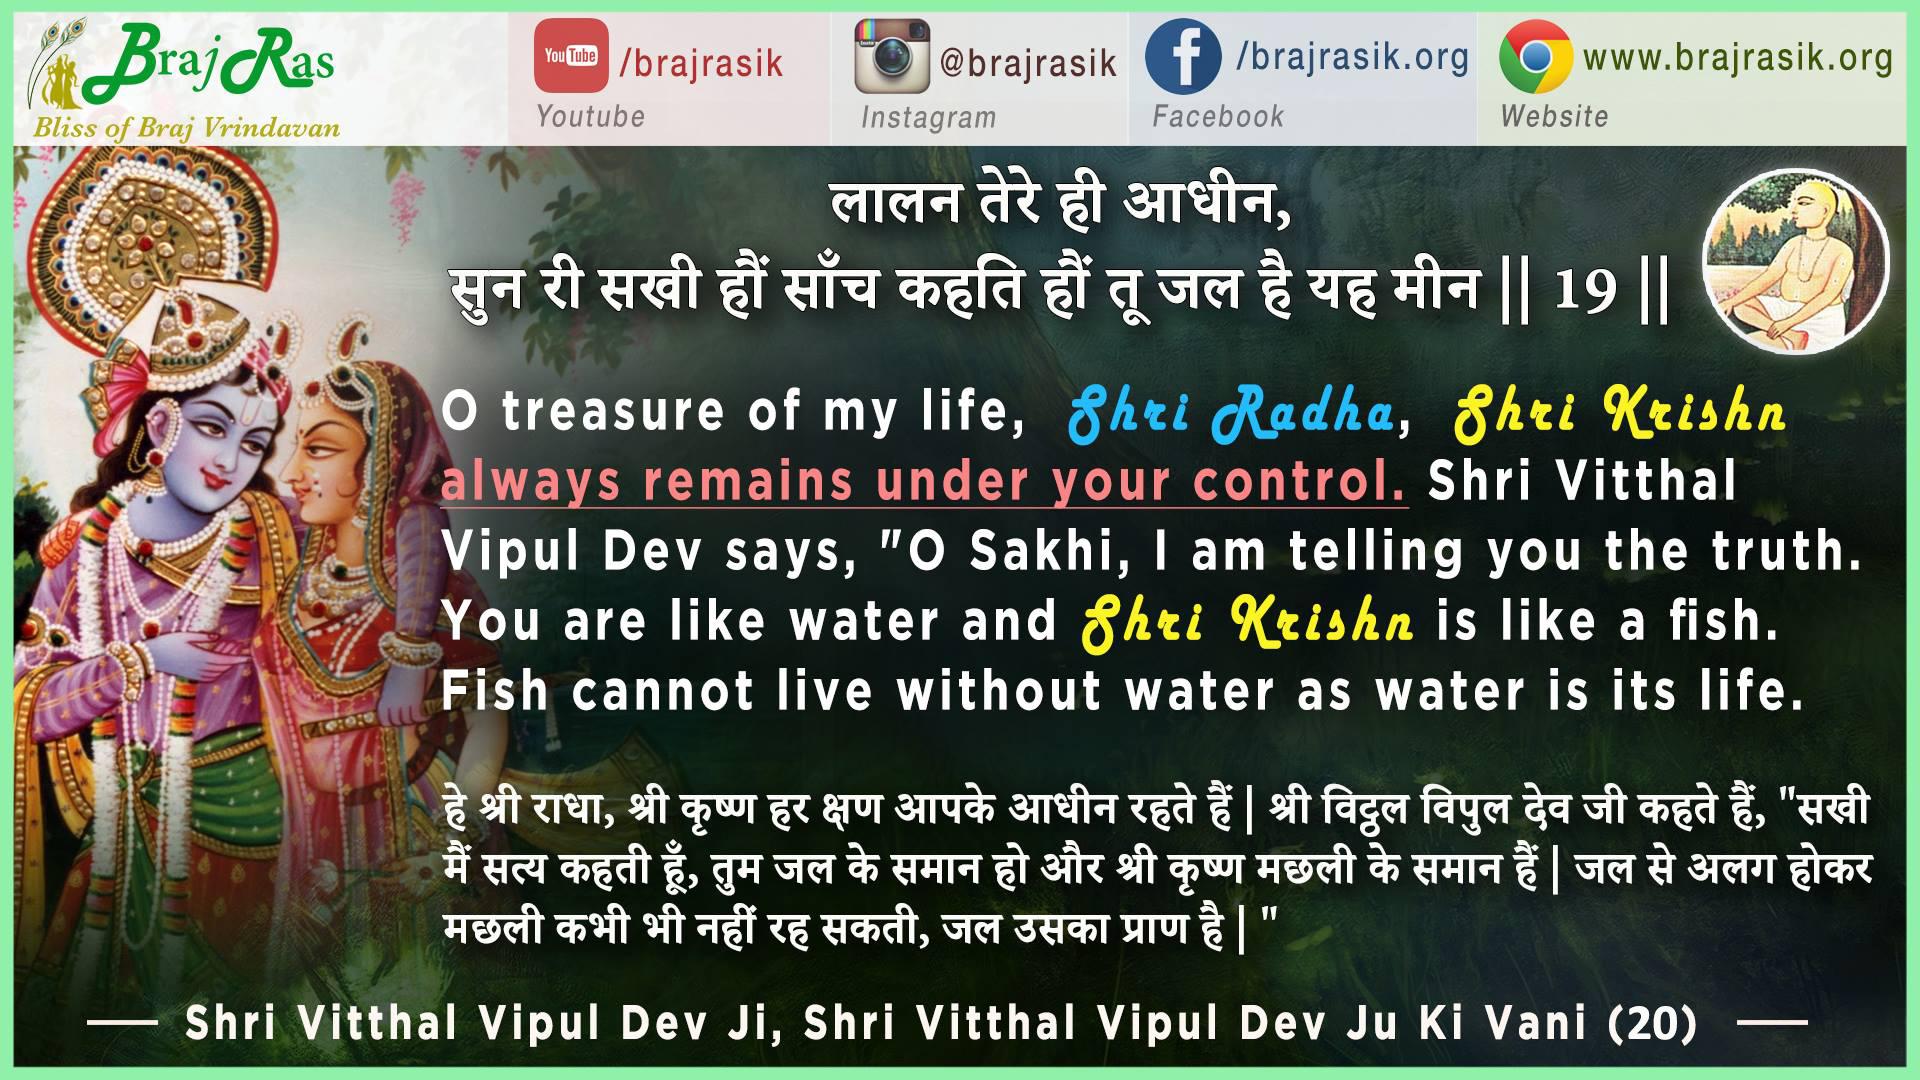 Lalan Tere Hi Aadhen, Sun Re Sakhi Hon Sanch Kahat Hon -  Shri Vitthal Vipul Dev Ju Ki Vani (19)